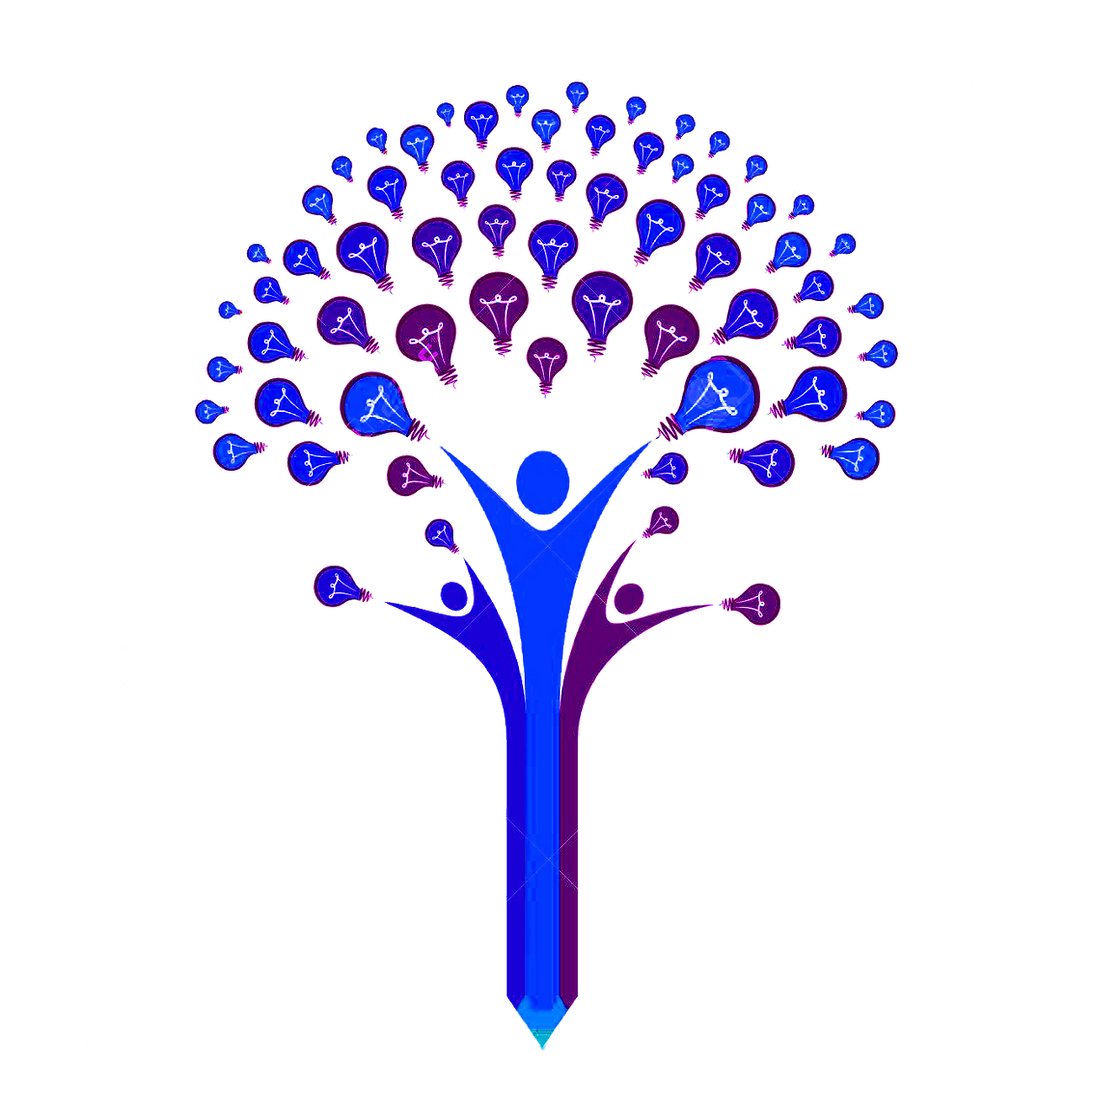 arbre-idée.png